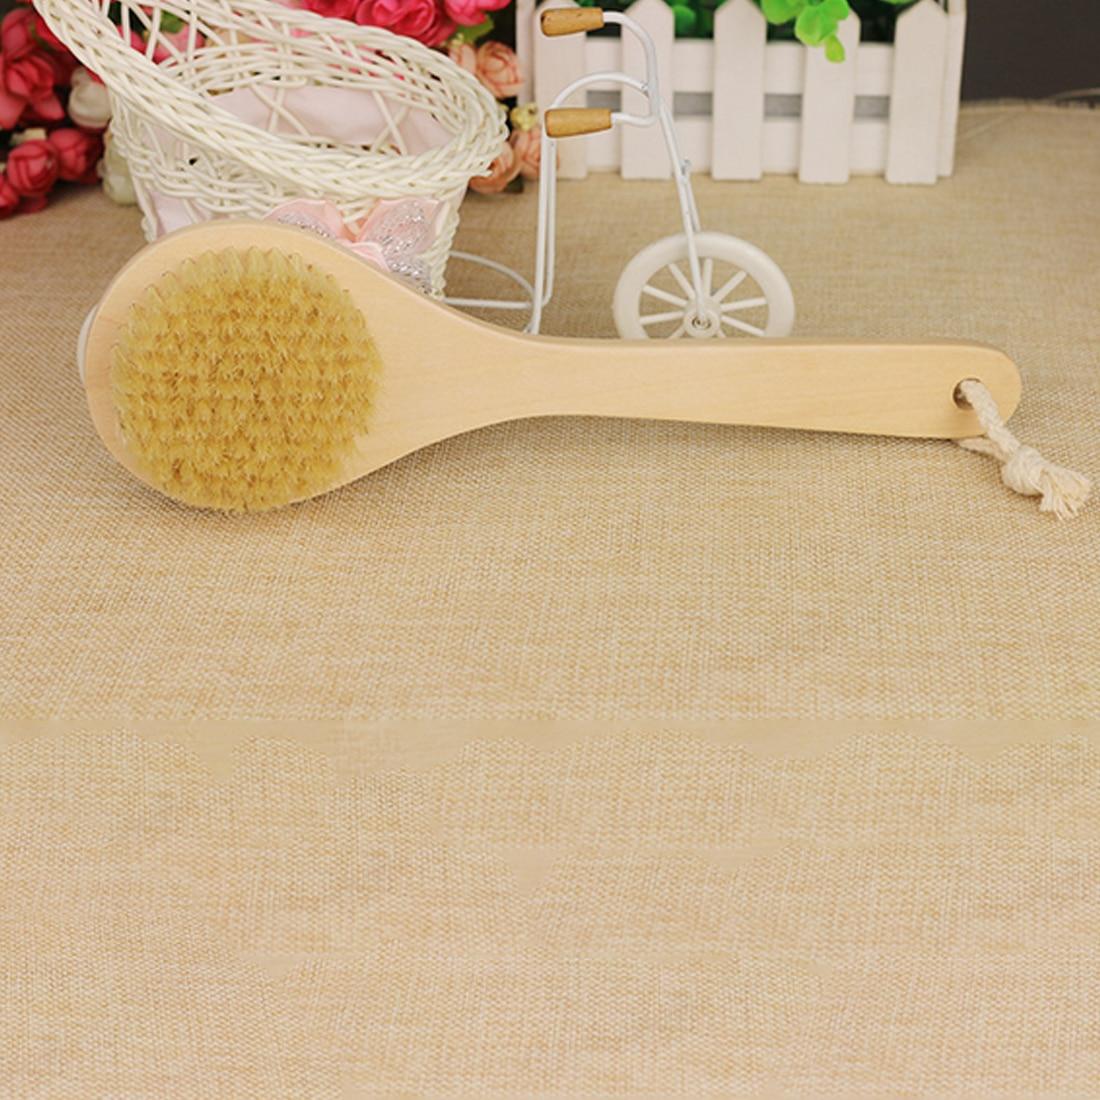 Promotions Bath Brush Wood Handle Natural Bristle Middle Long Handle Wooden Shower Body Bath Brush Round Head Bath Accessory